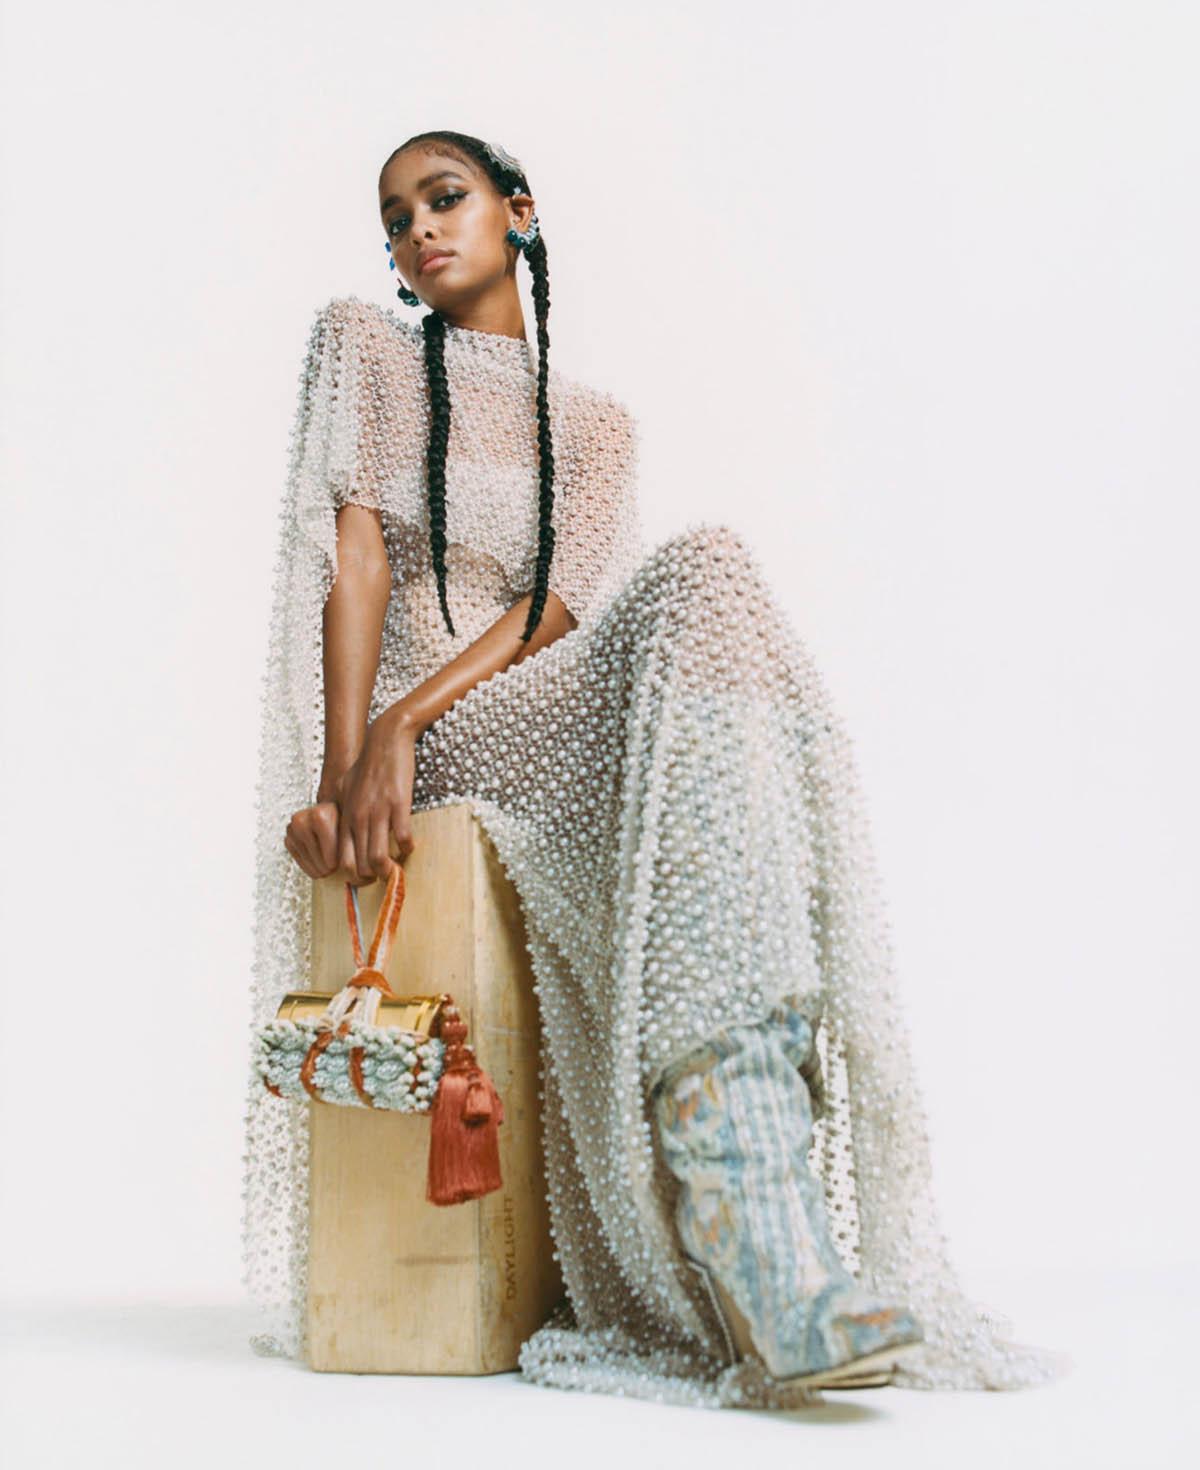 Blesnya Minher by Alexandre Guirkinger for Harper's Bazaar US April 2021